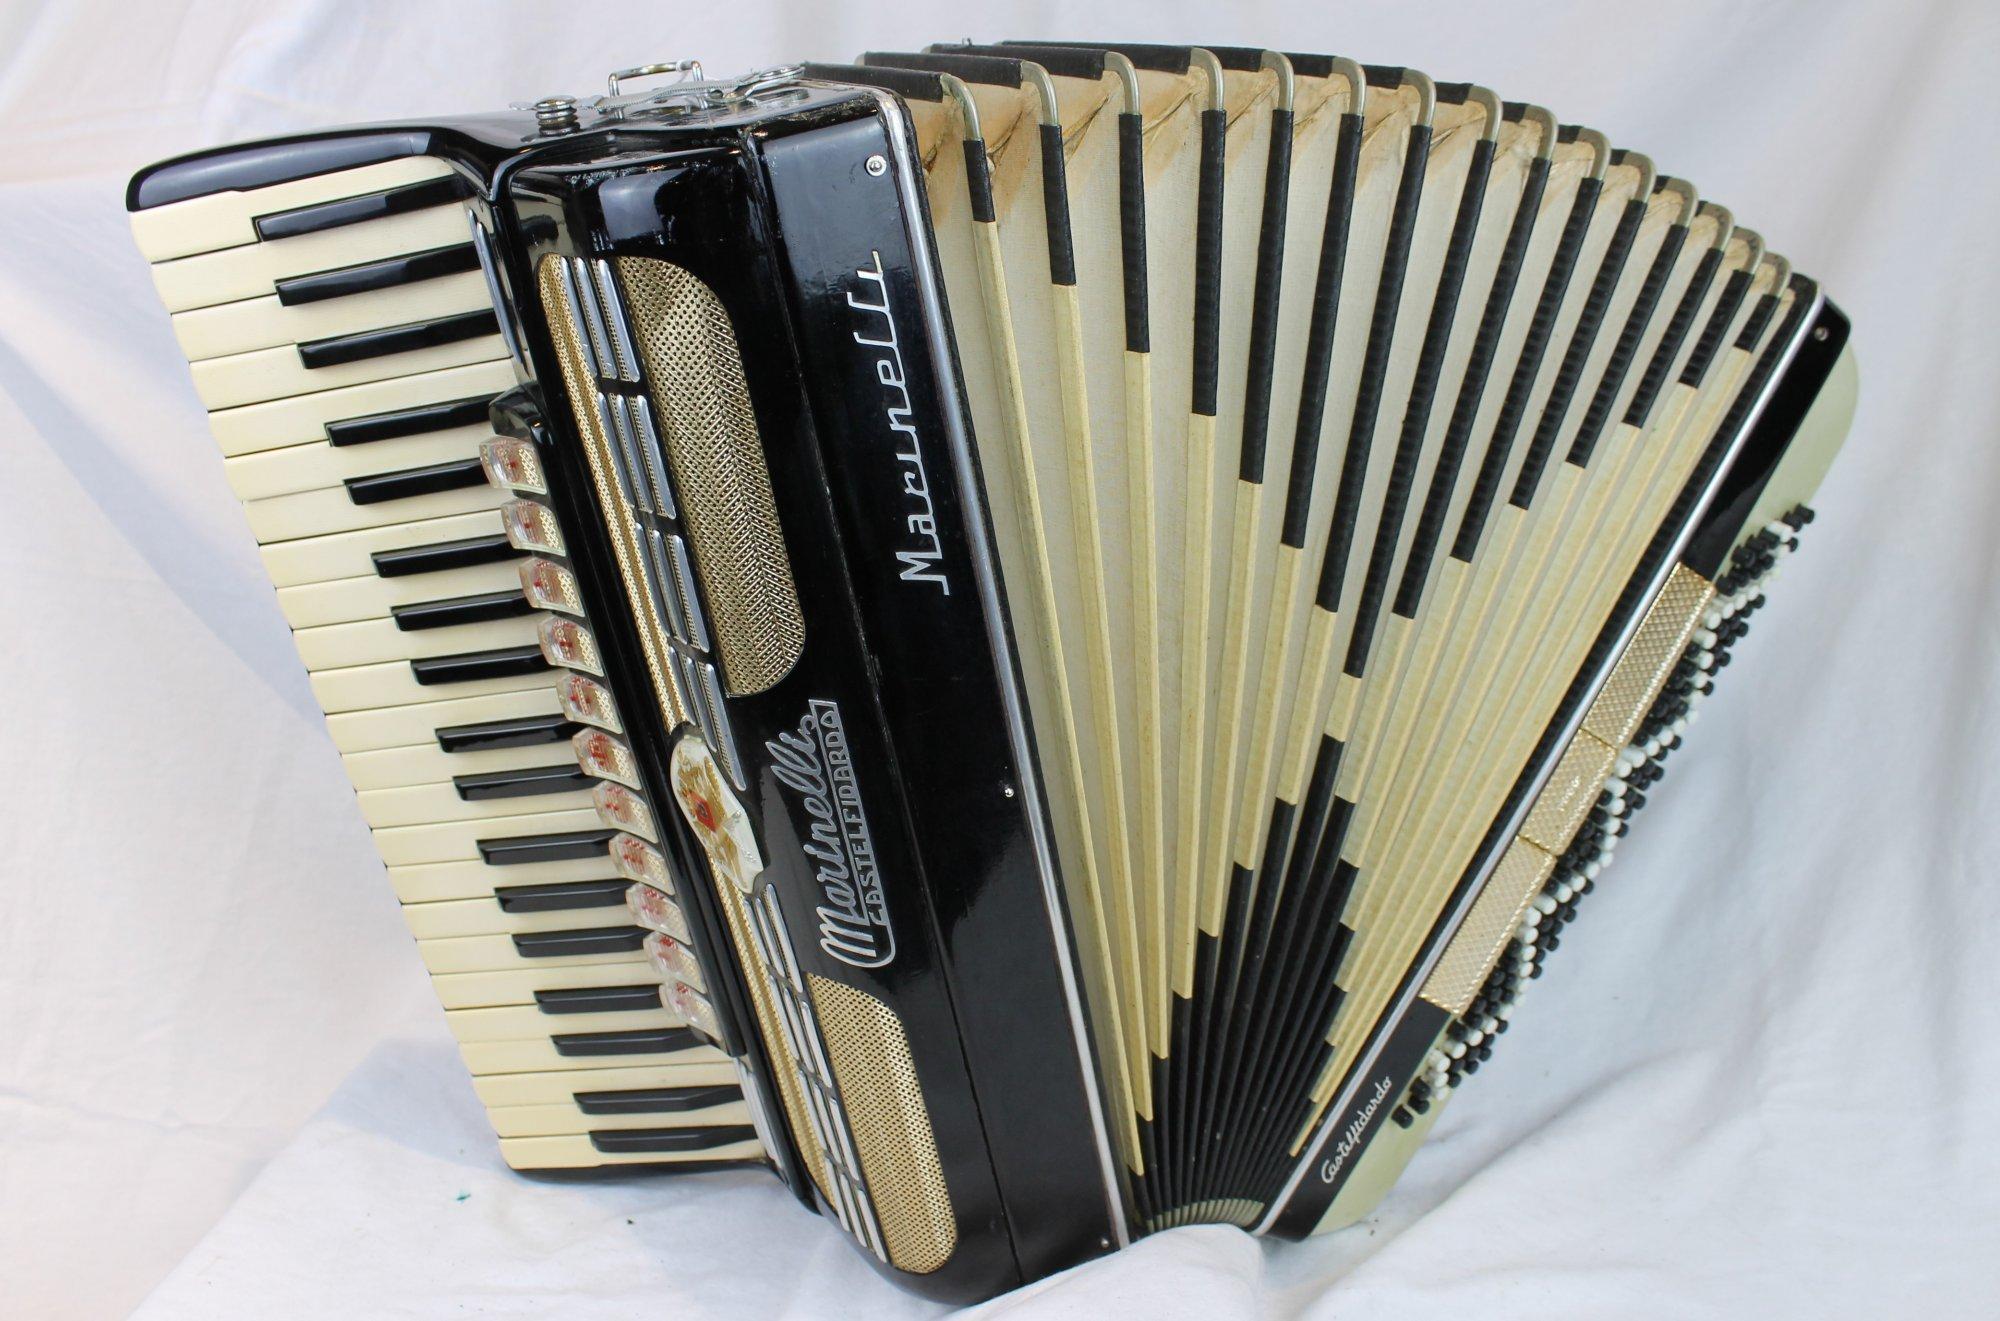 6029 - Black Marinelli Castelfidardo Piano Accordion LMMH 41 120